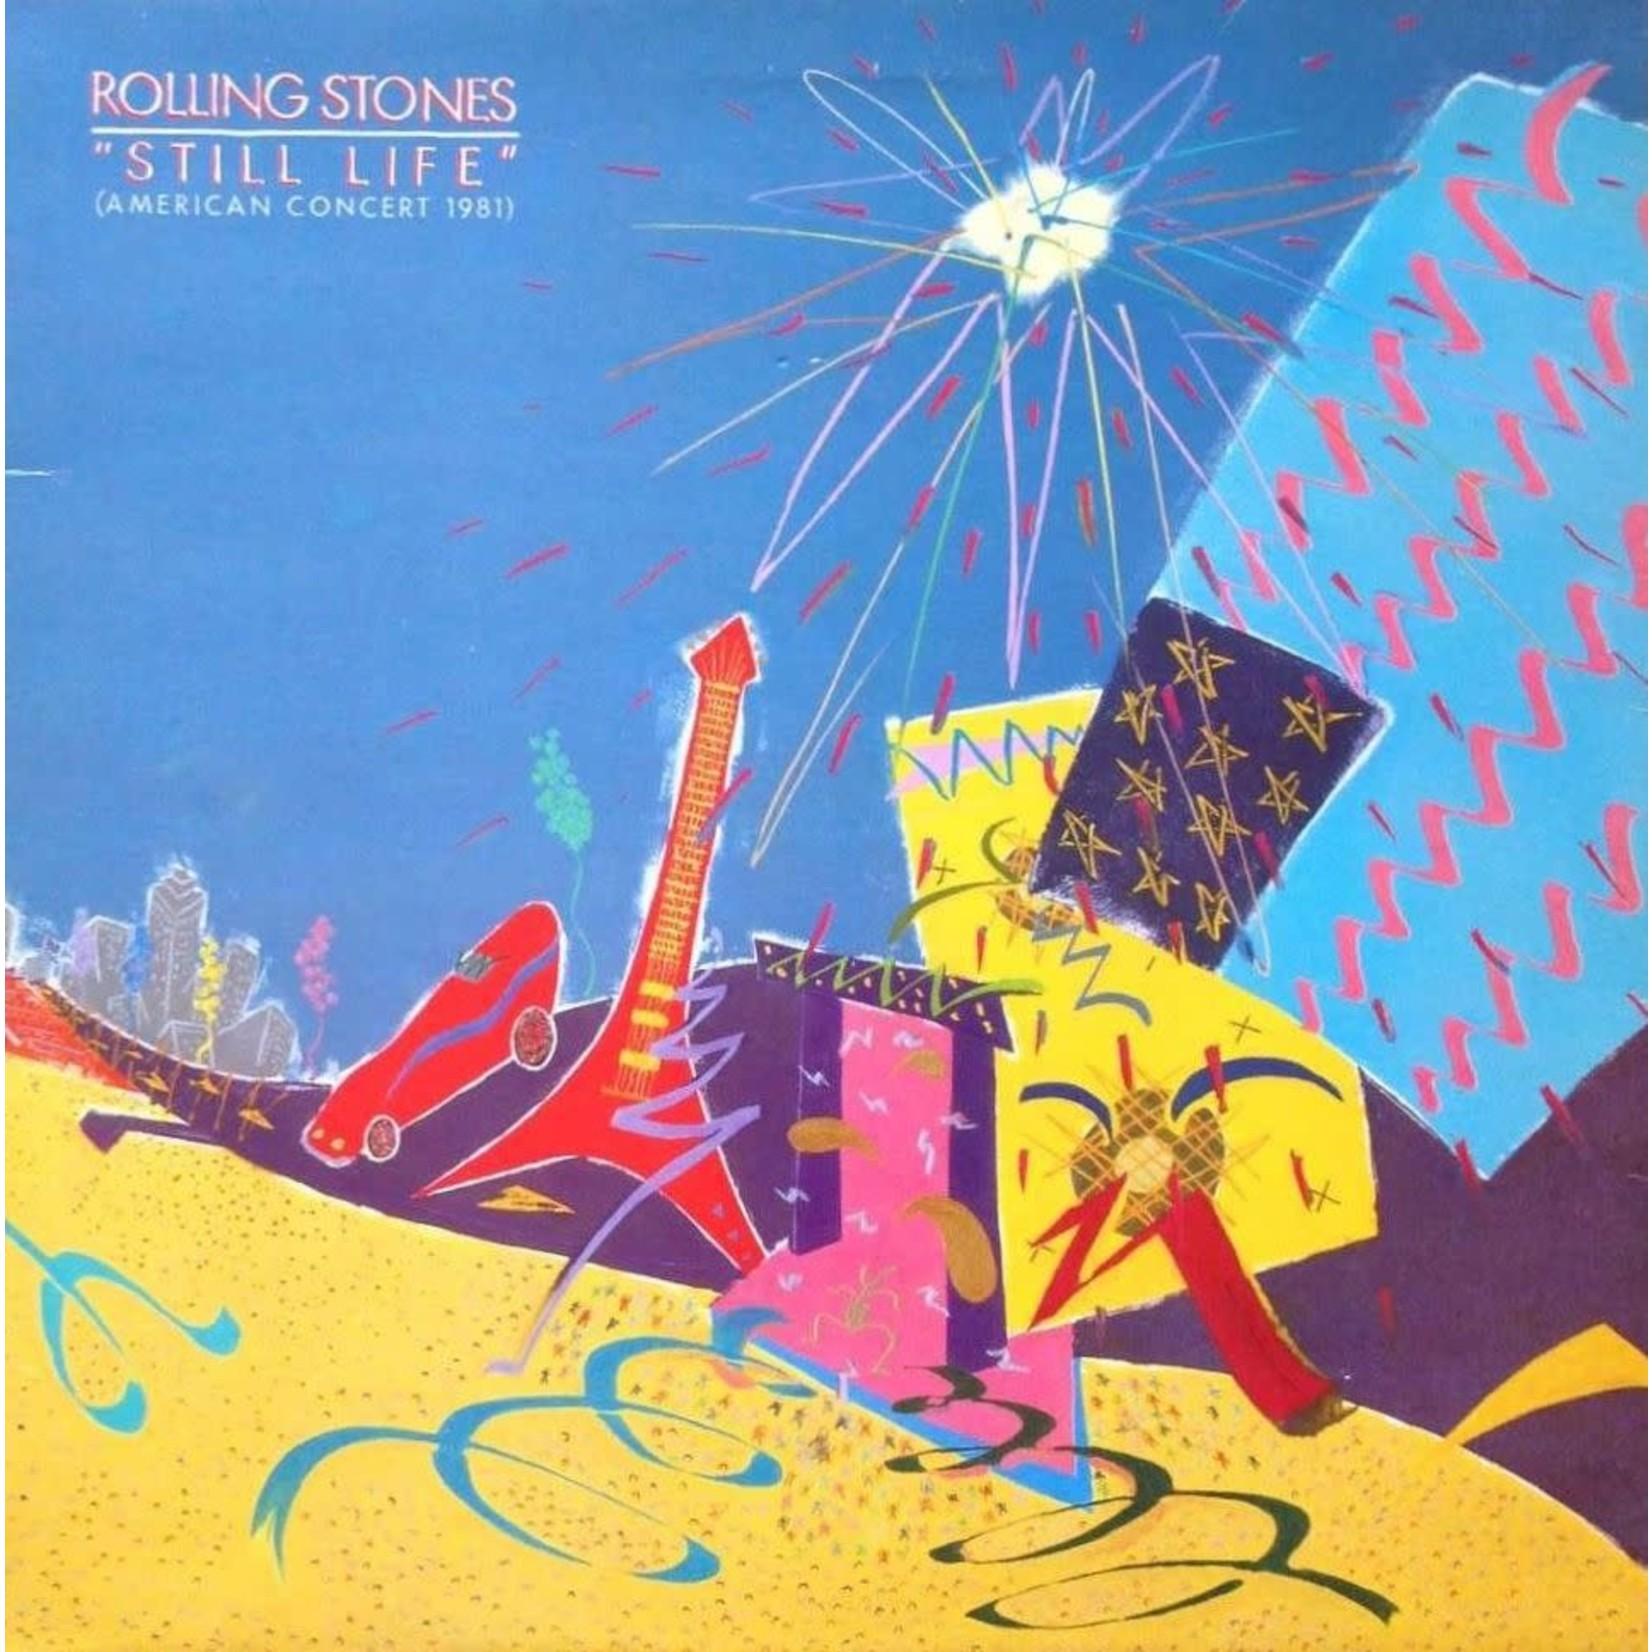 [Vintage] Rolling Stones: Still Life (American Concert 1981)